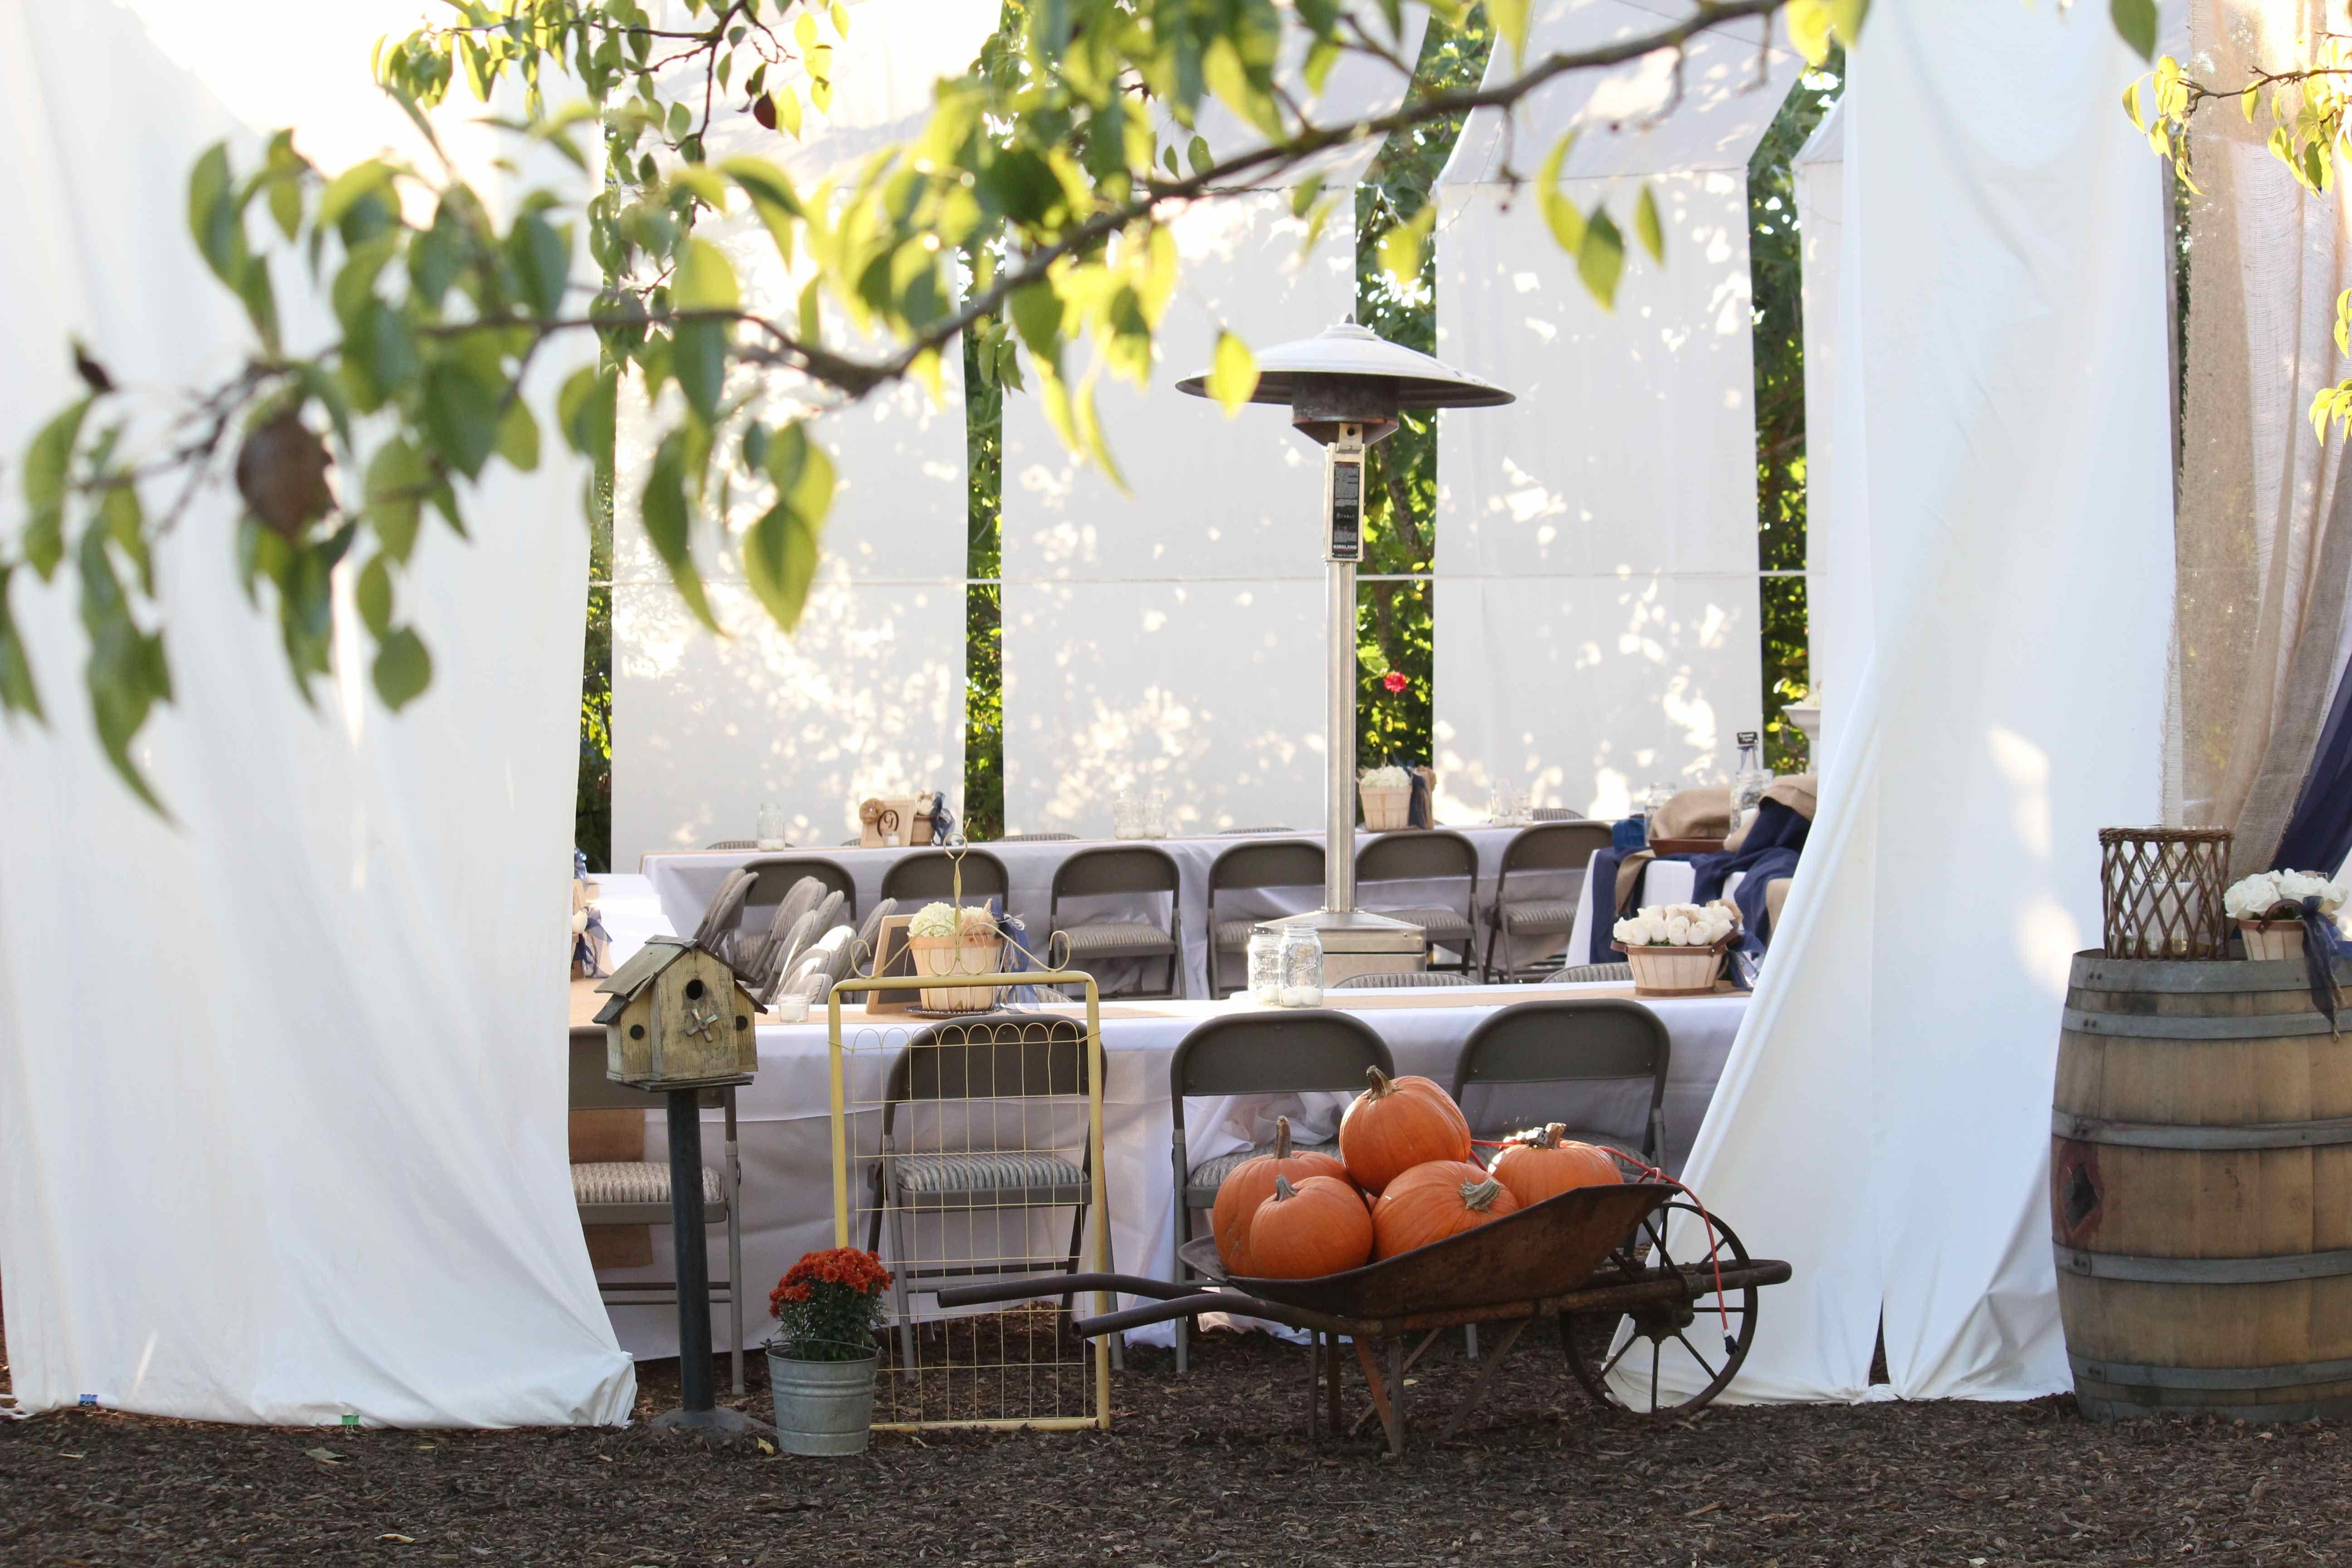 homemade tent to enclose the magic diy backyard wedding